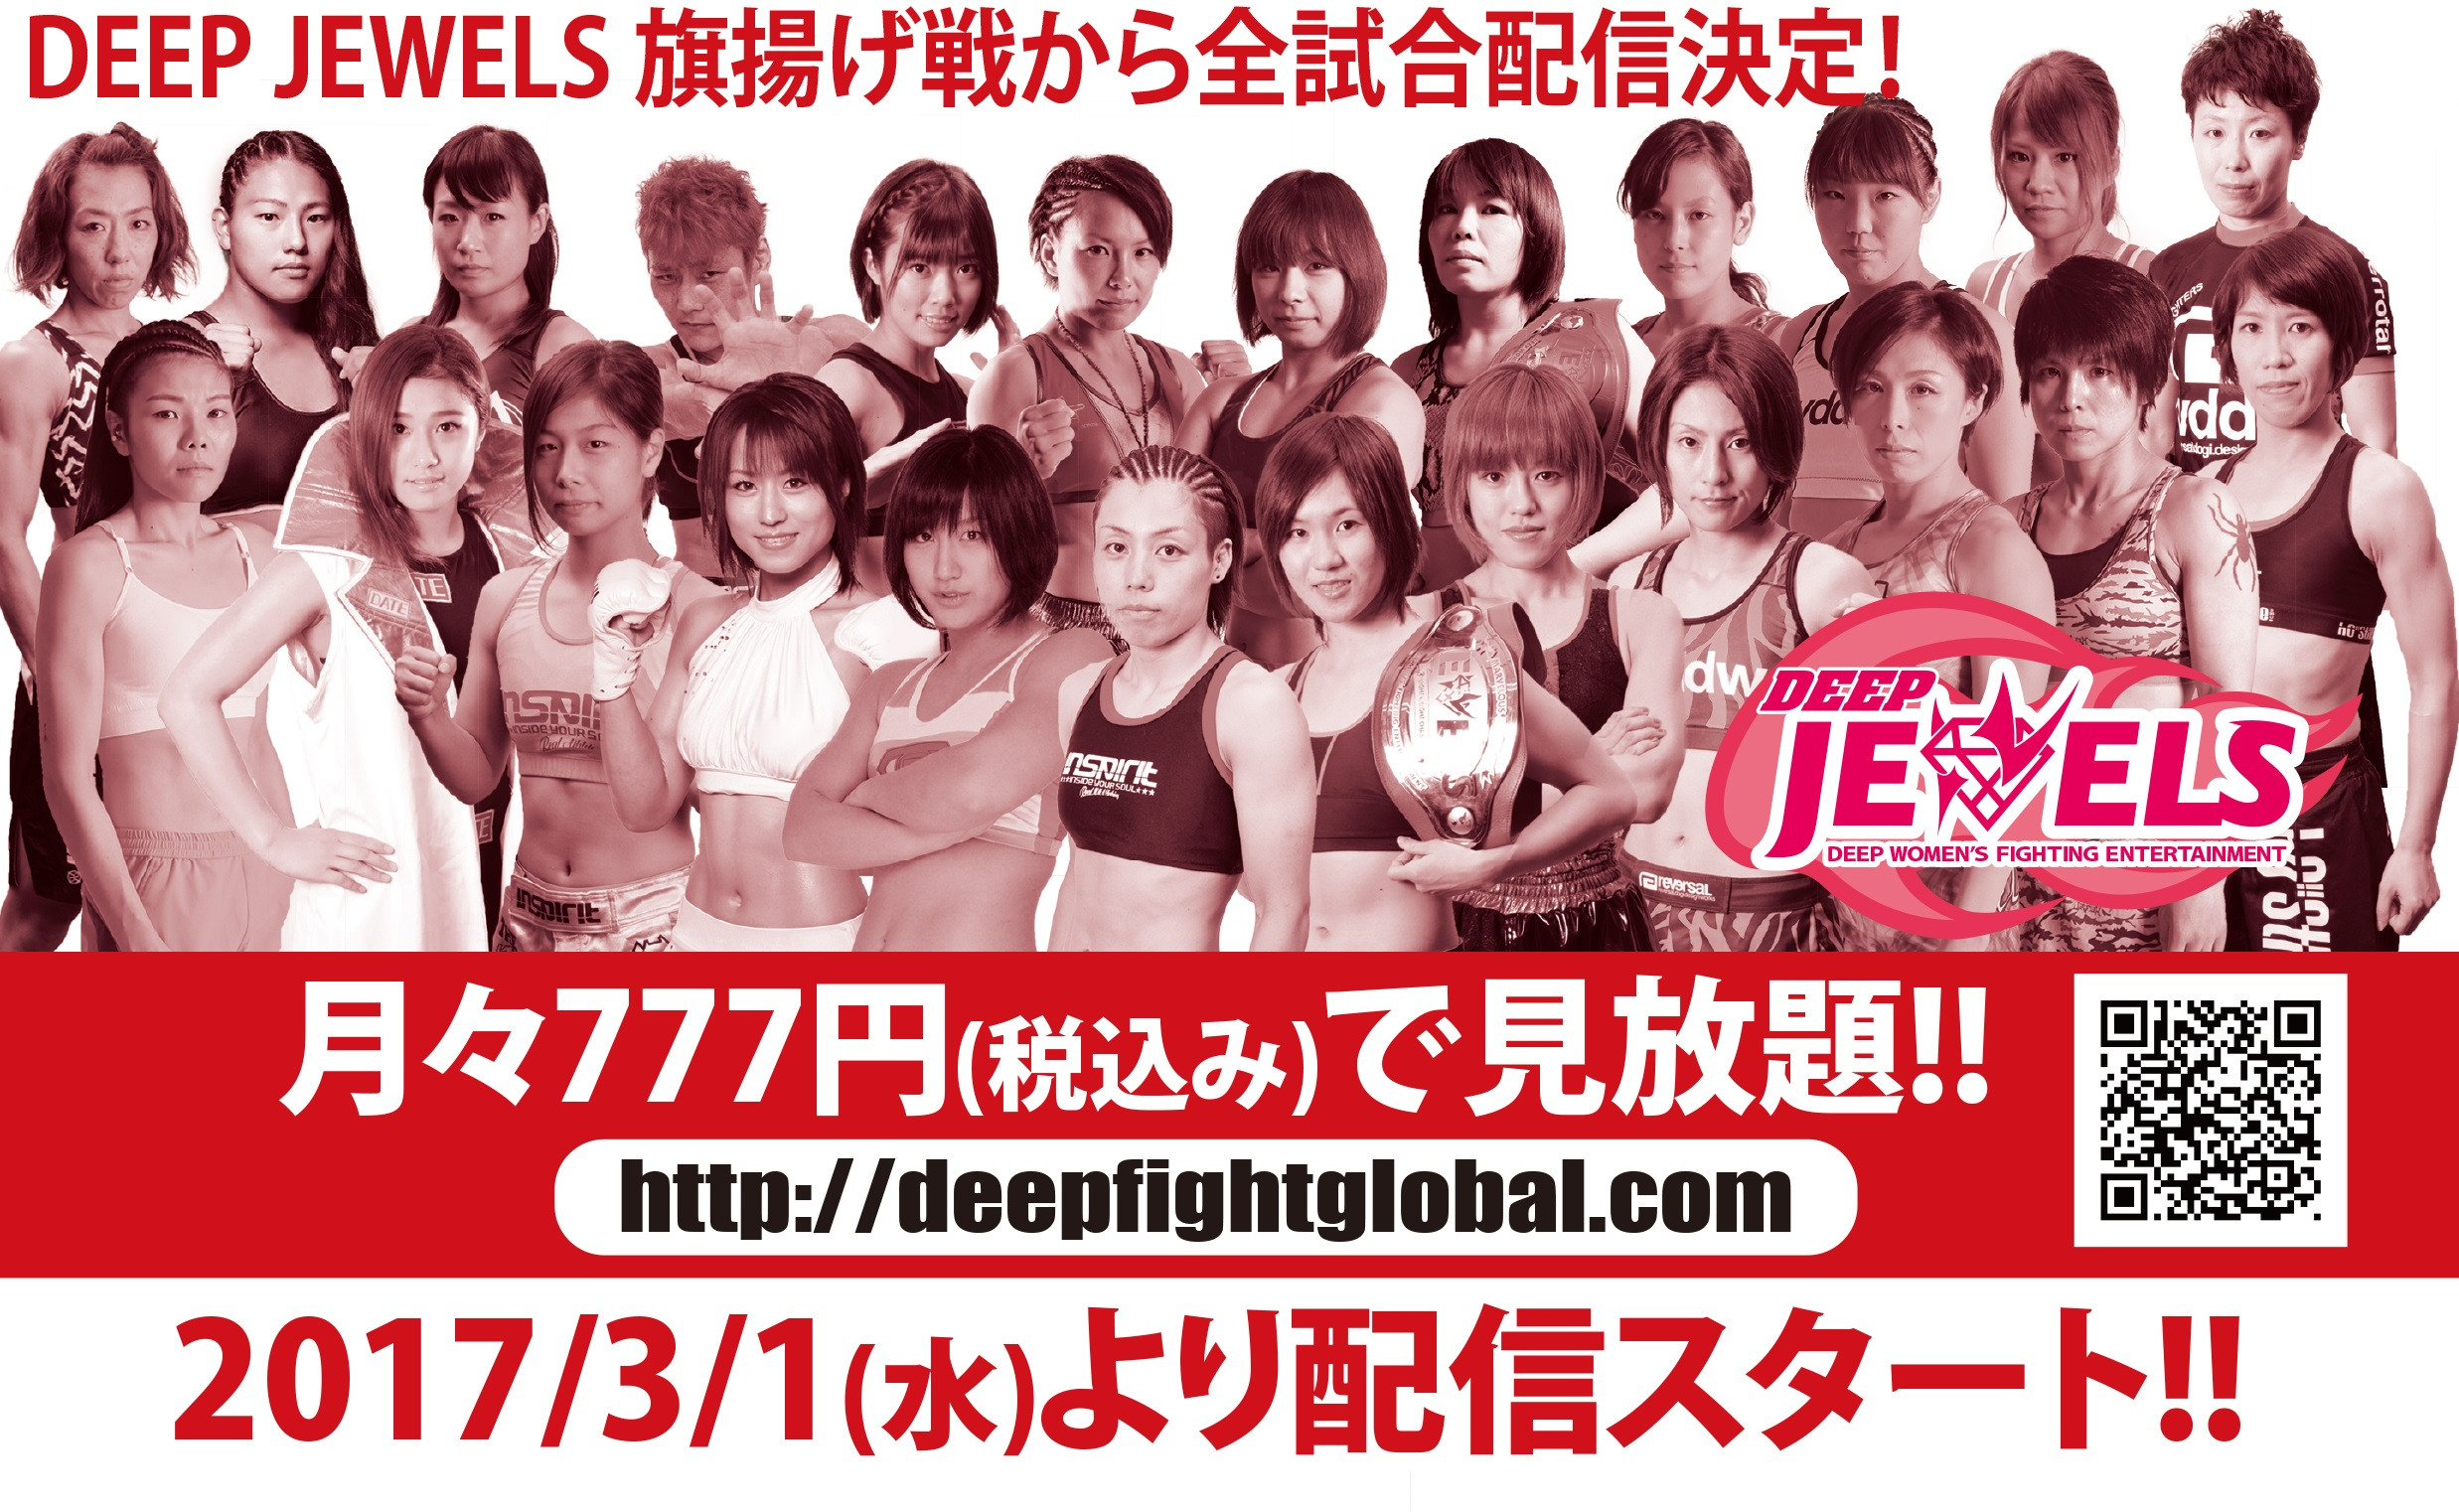 DEEP JEWELS 15